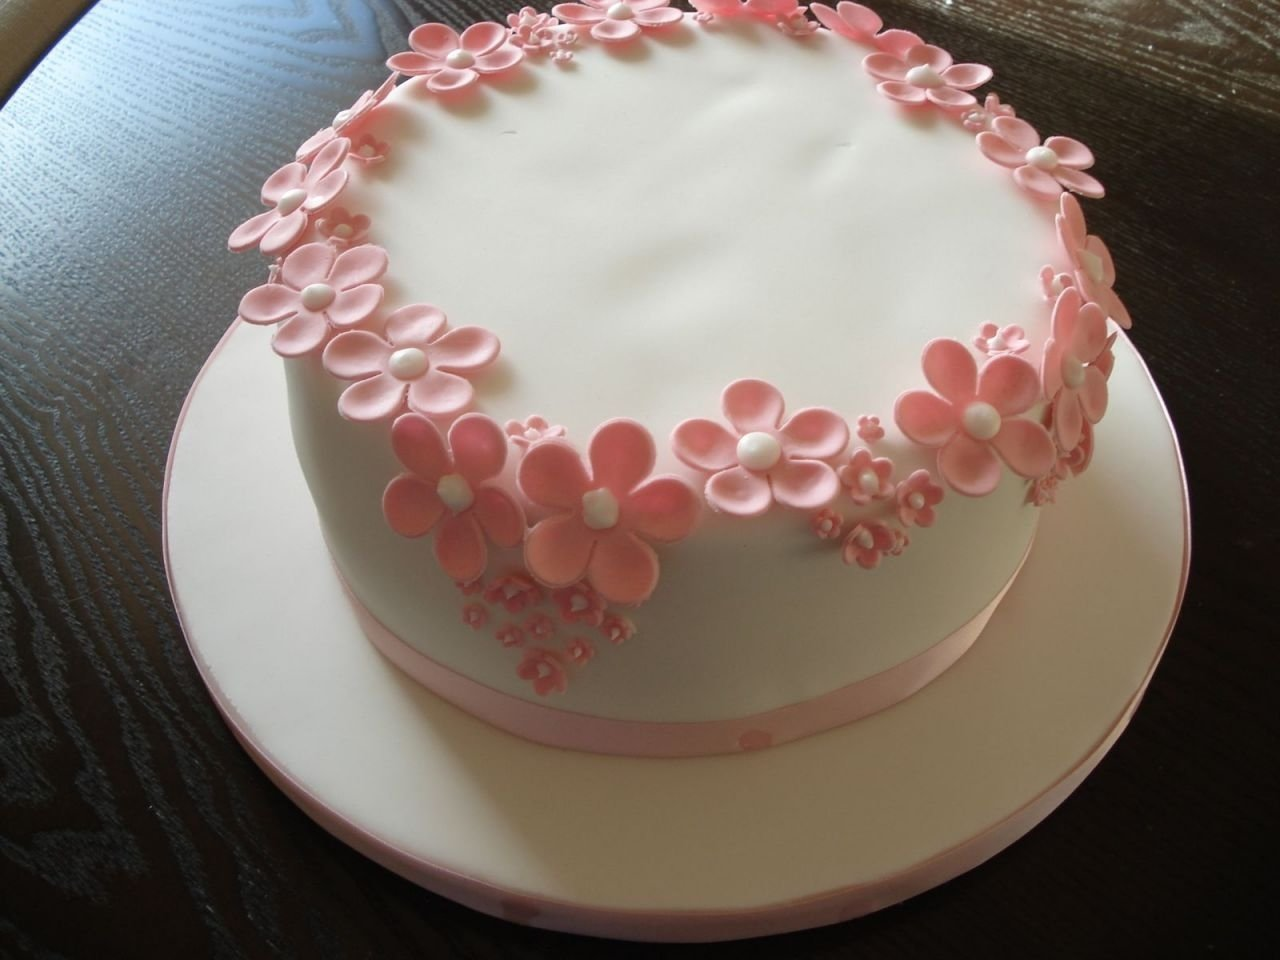 10 Pretty Birthday Cake Ideas For Girls girls birthday cake ideas pink flowers cake ideas pinterest 2021